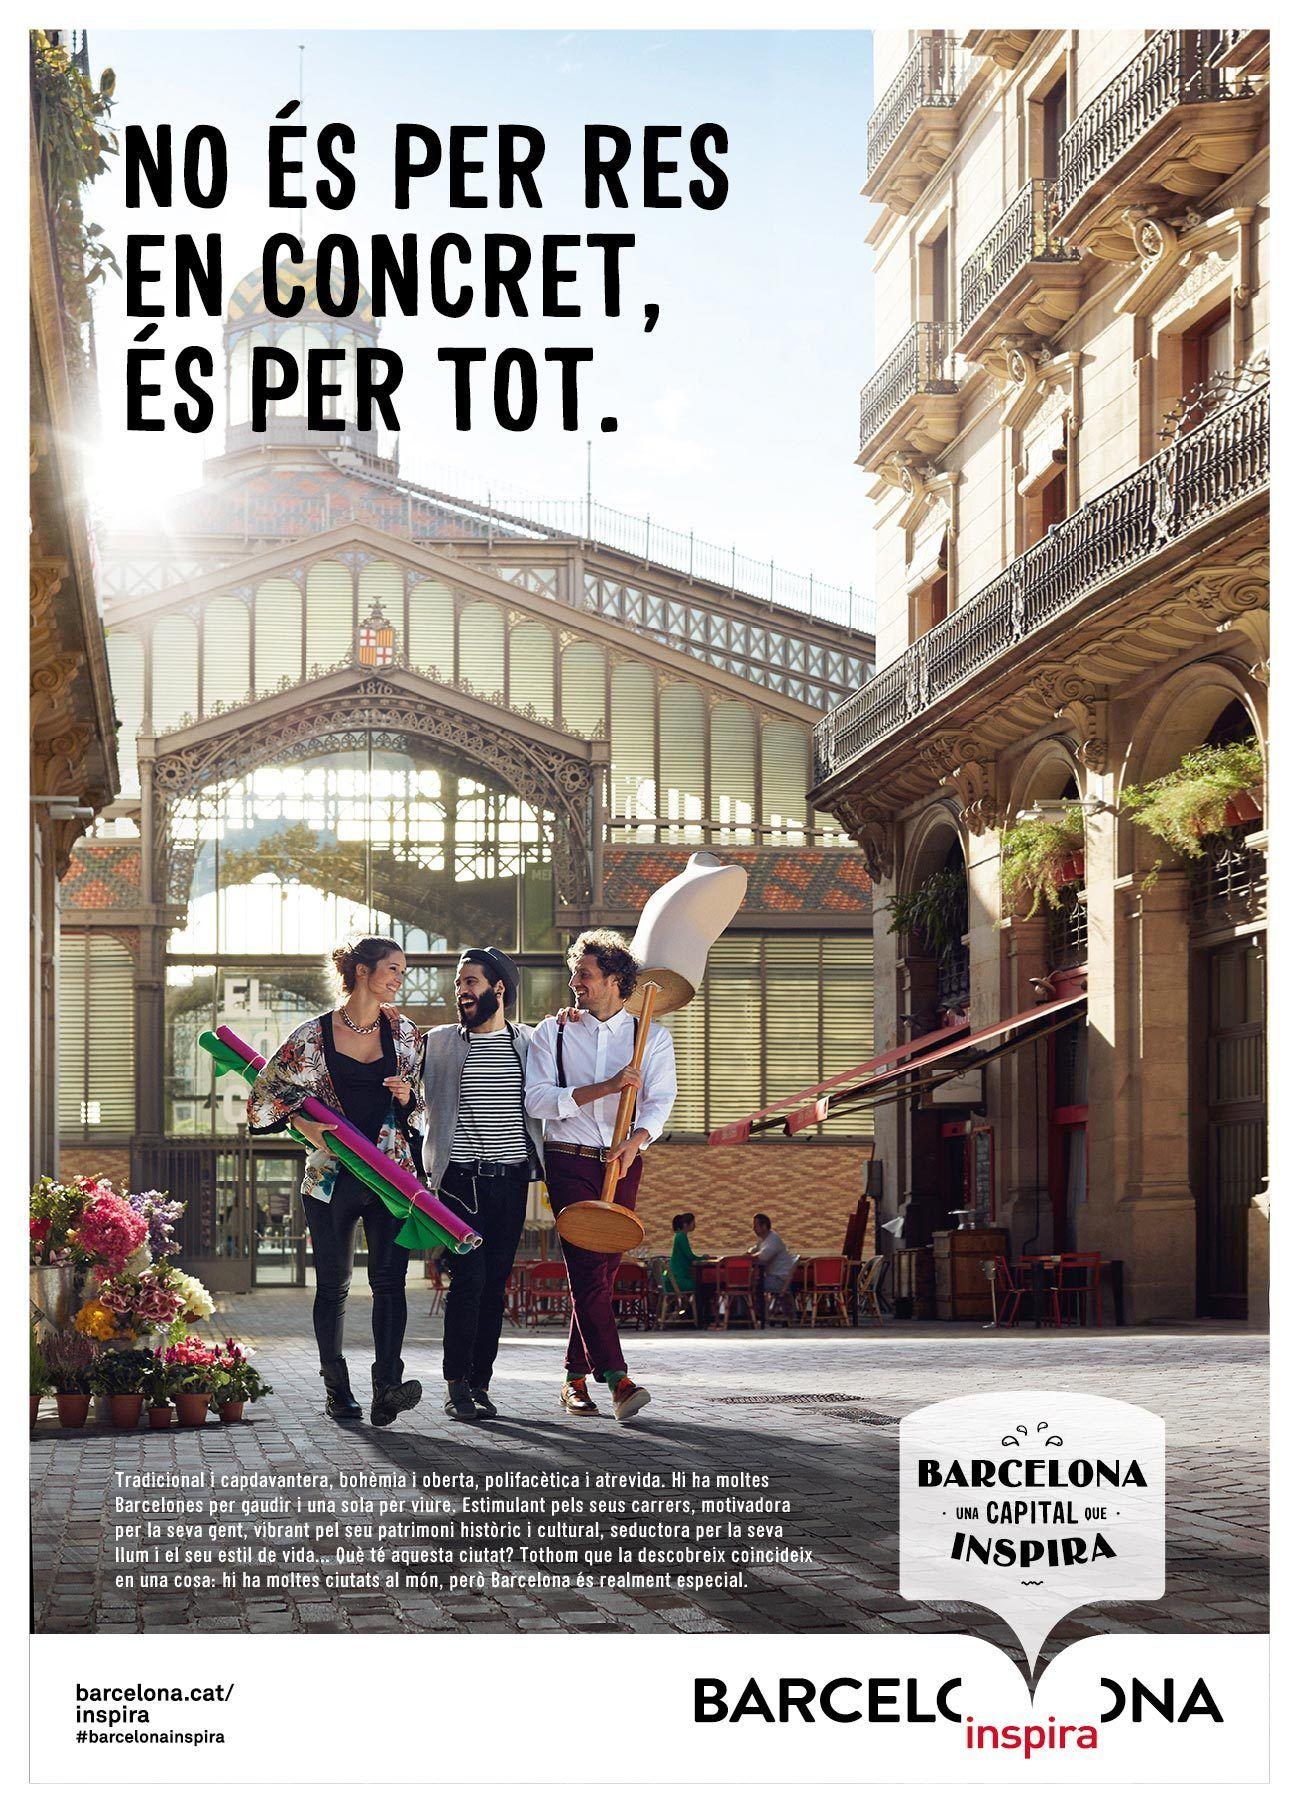 BARCELONA INSPIRA BY CARLES CARABI